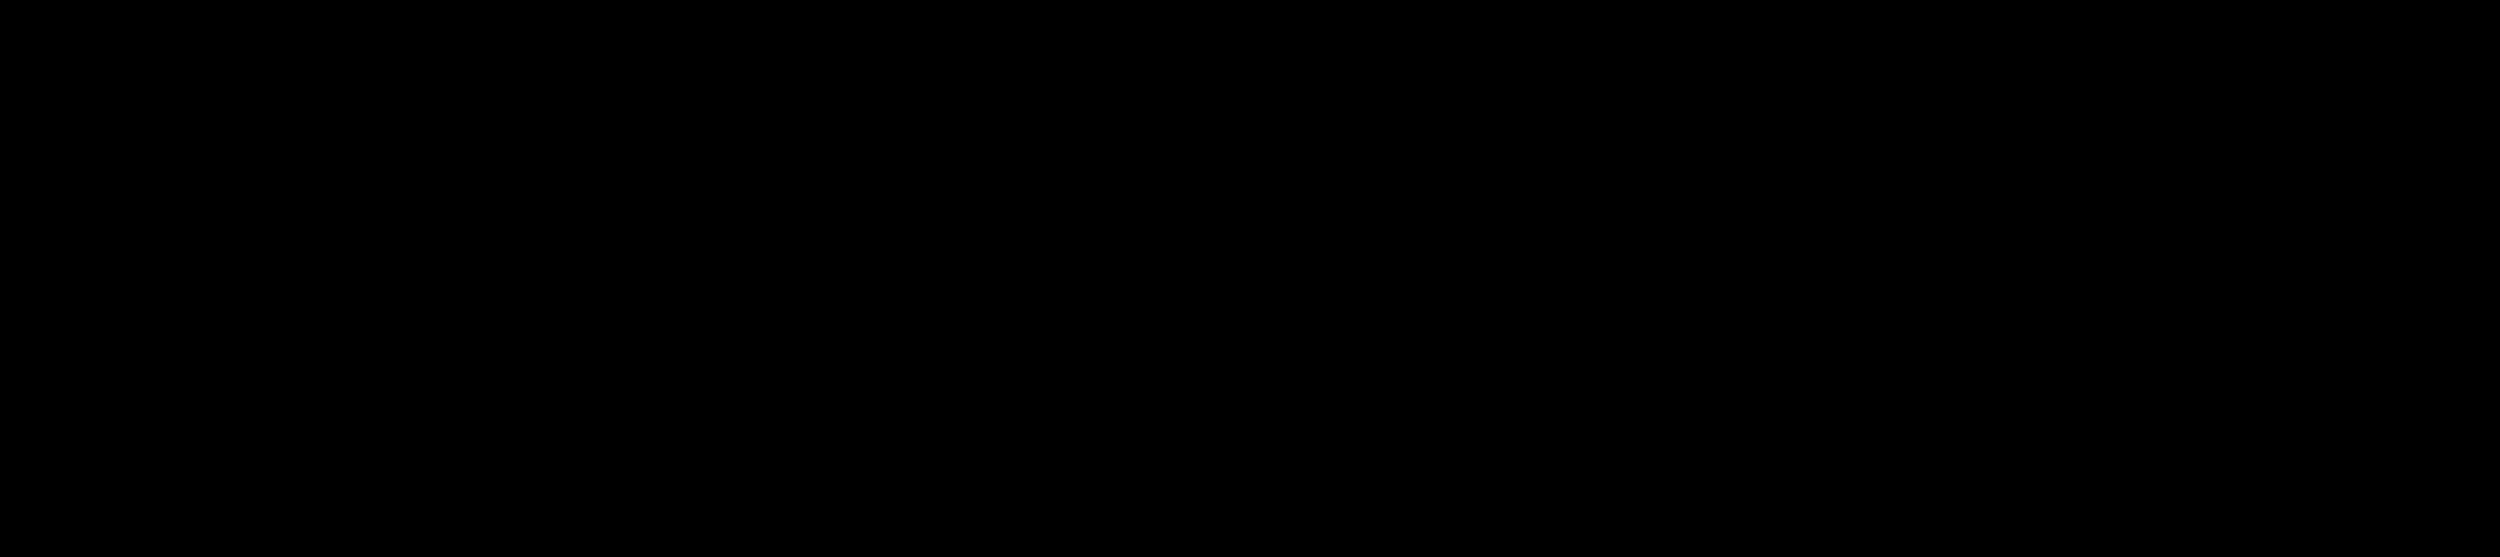 Patrick Winzler – Film & Video Producer Logo